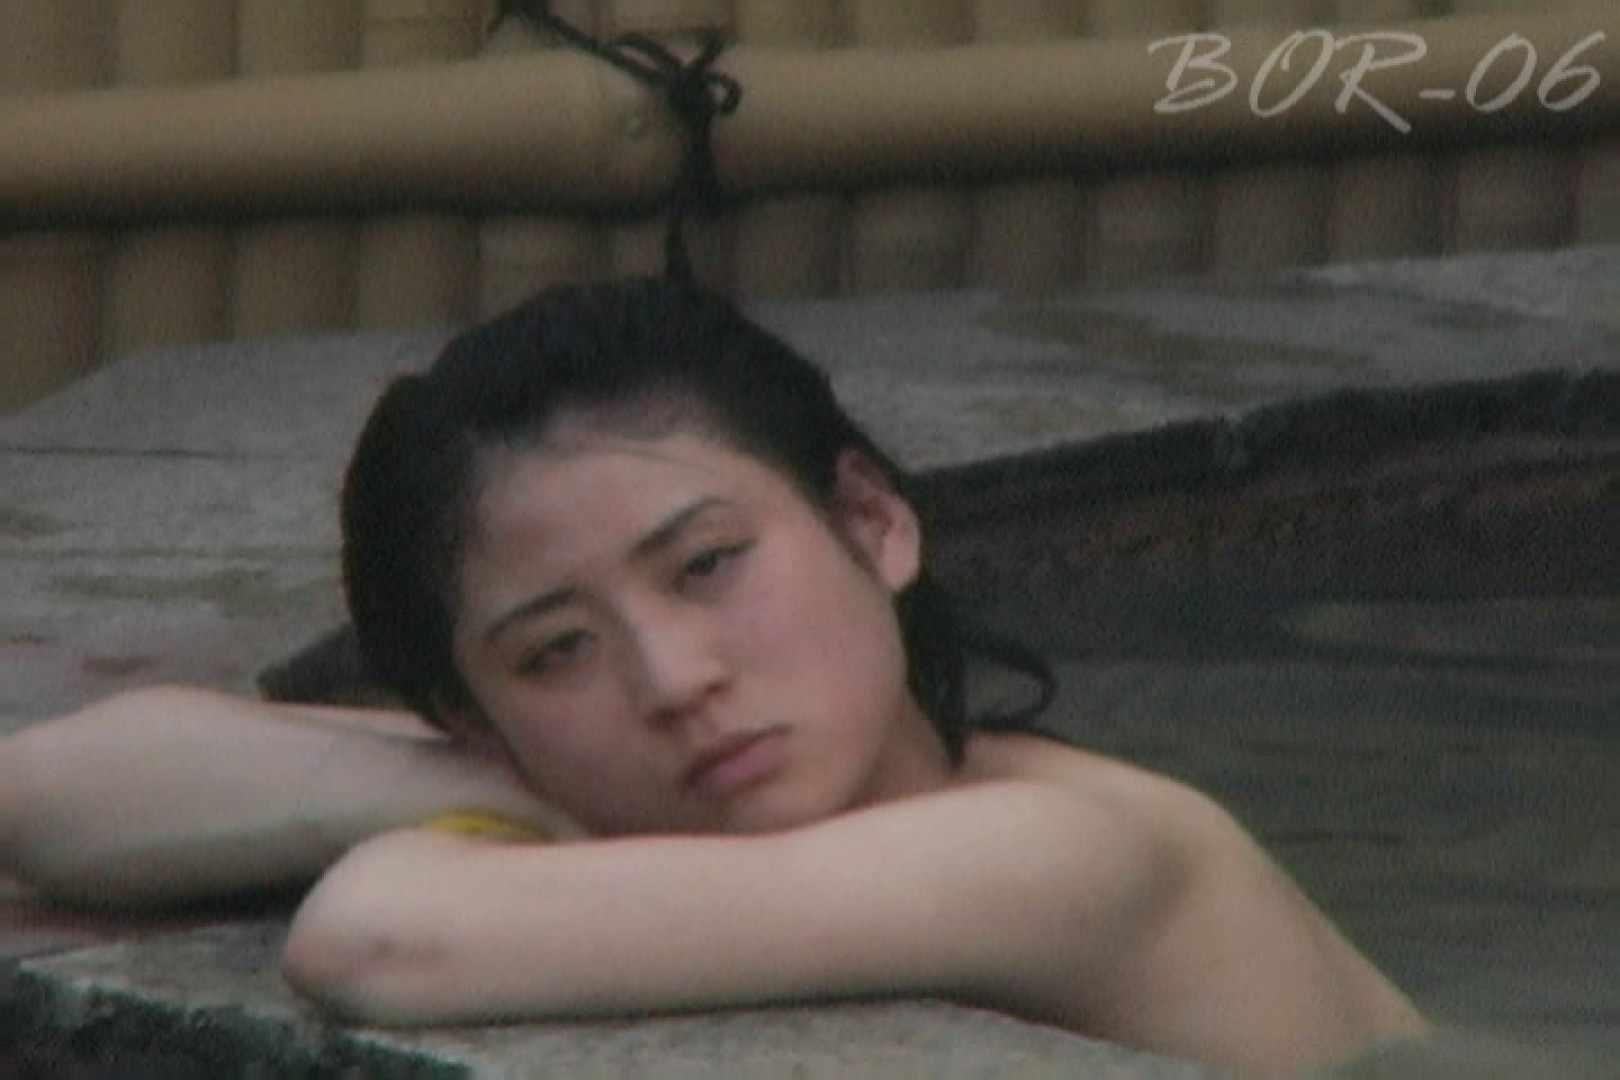 Aquaな露天風呂Vol.520 OL女体  52連発 39